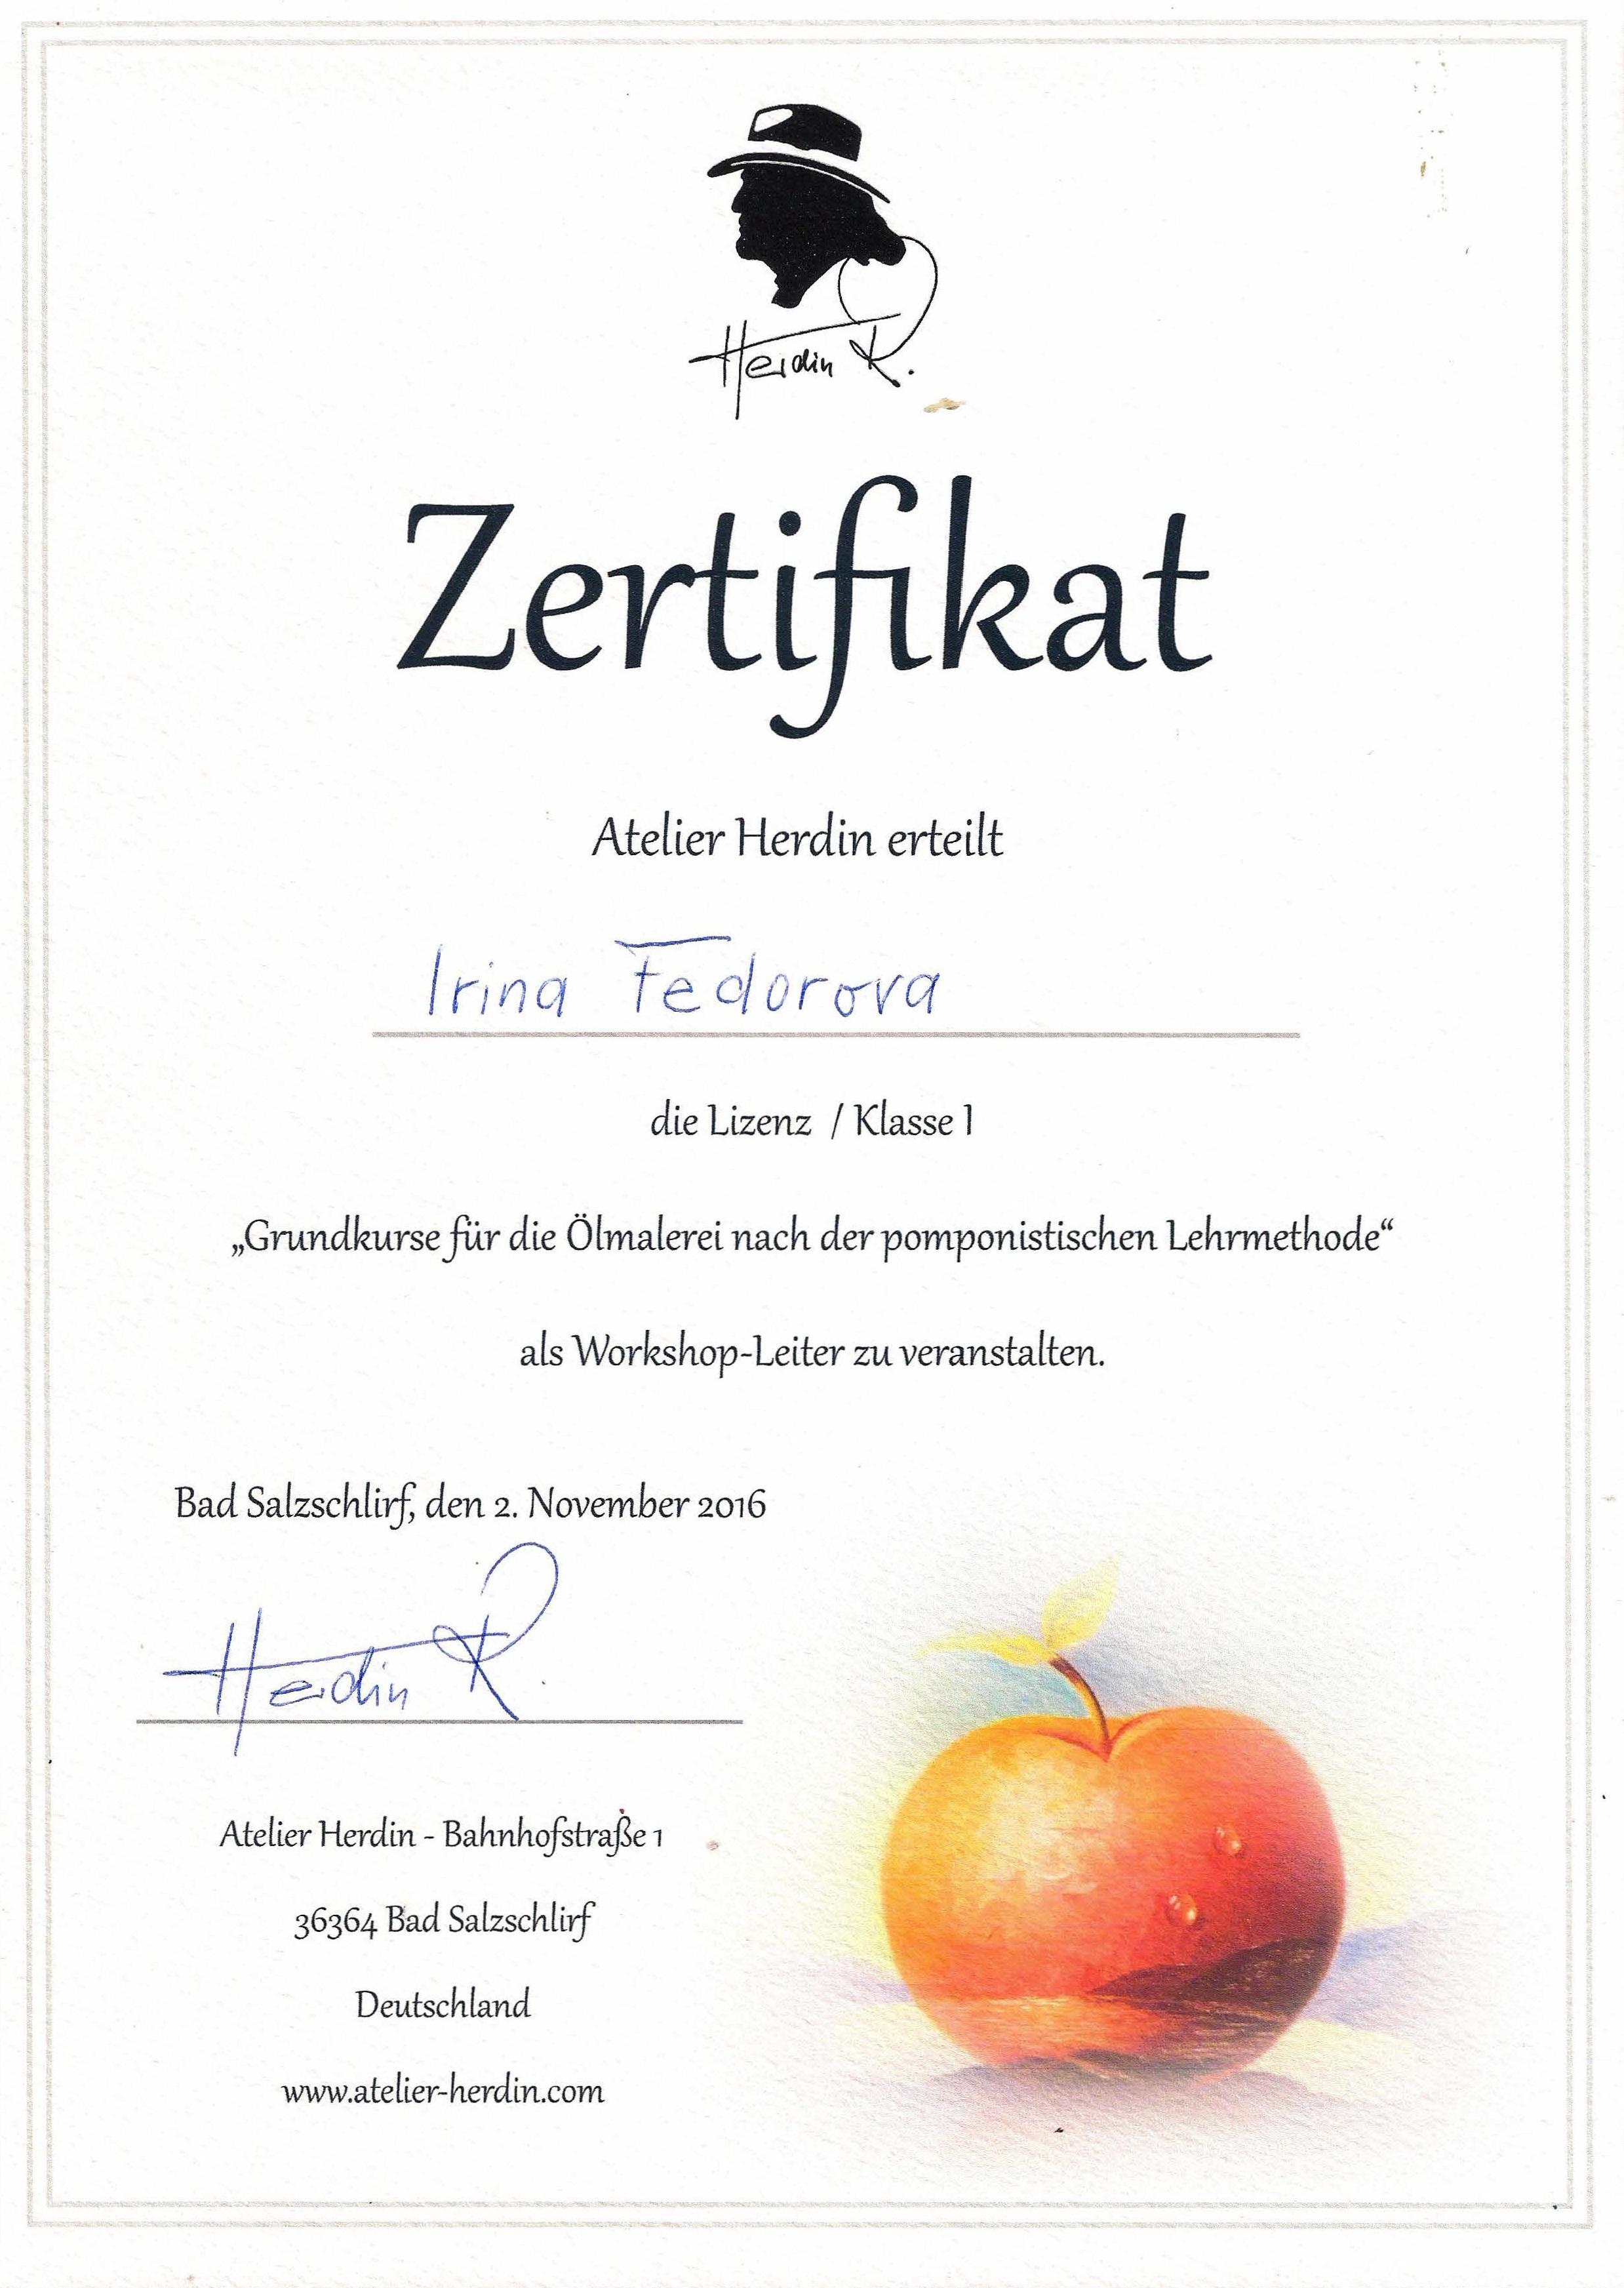 Herdins Zertifikate